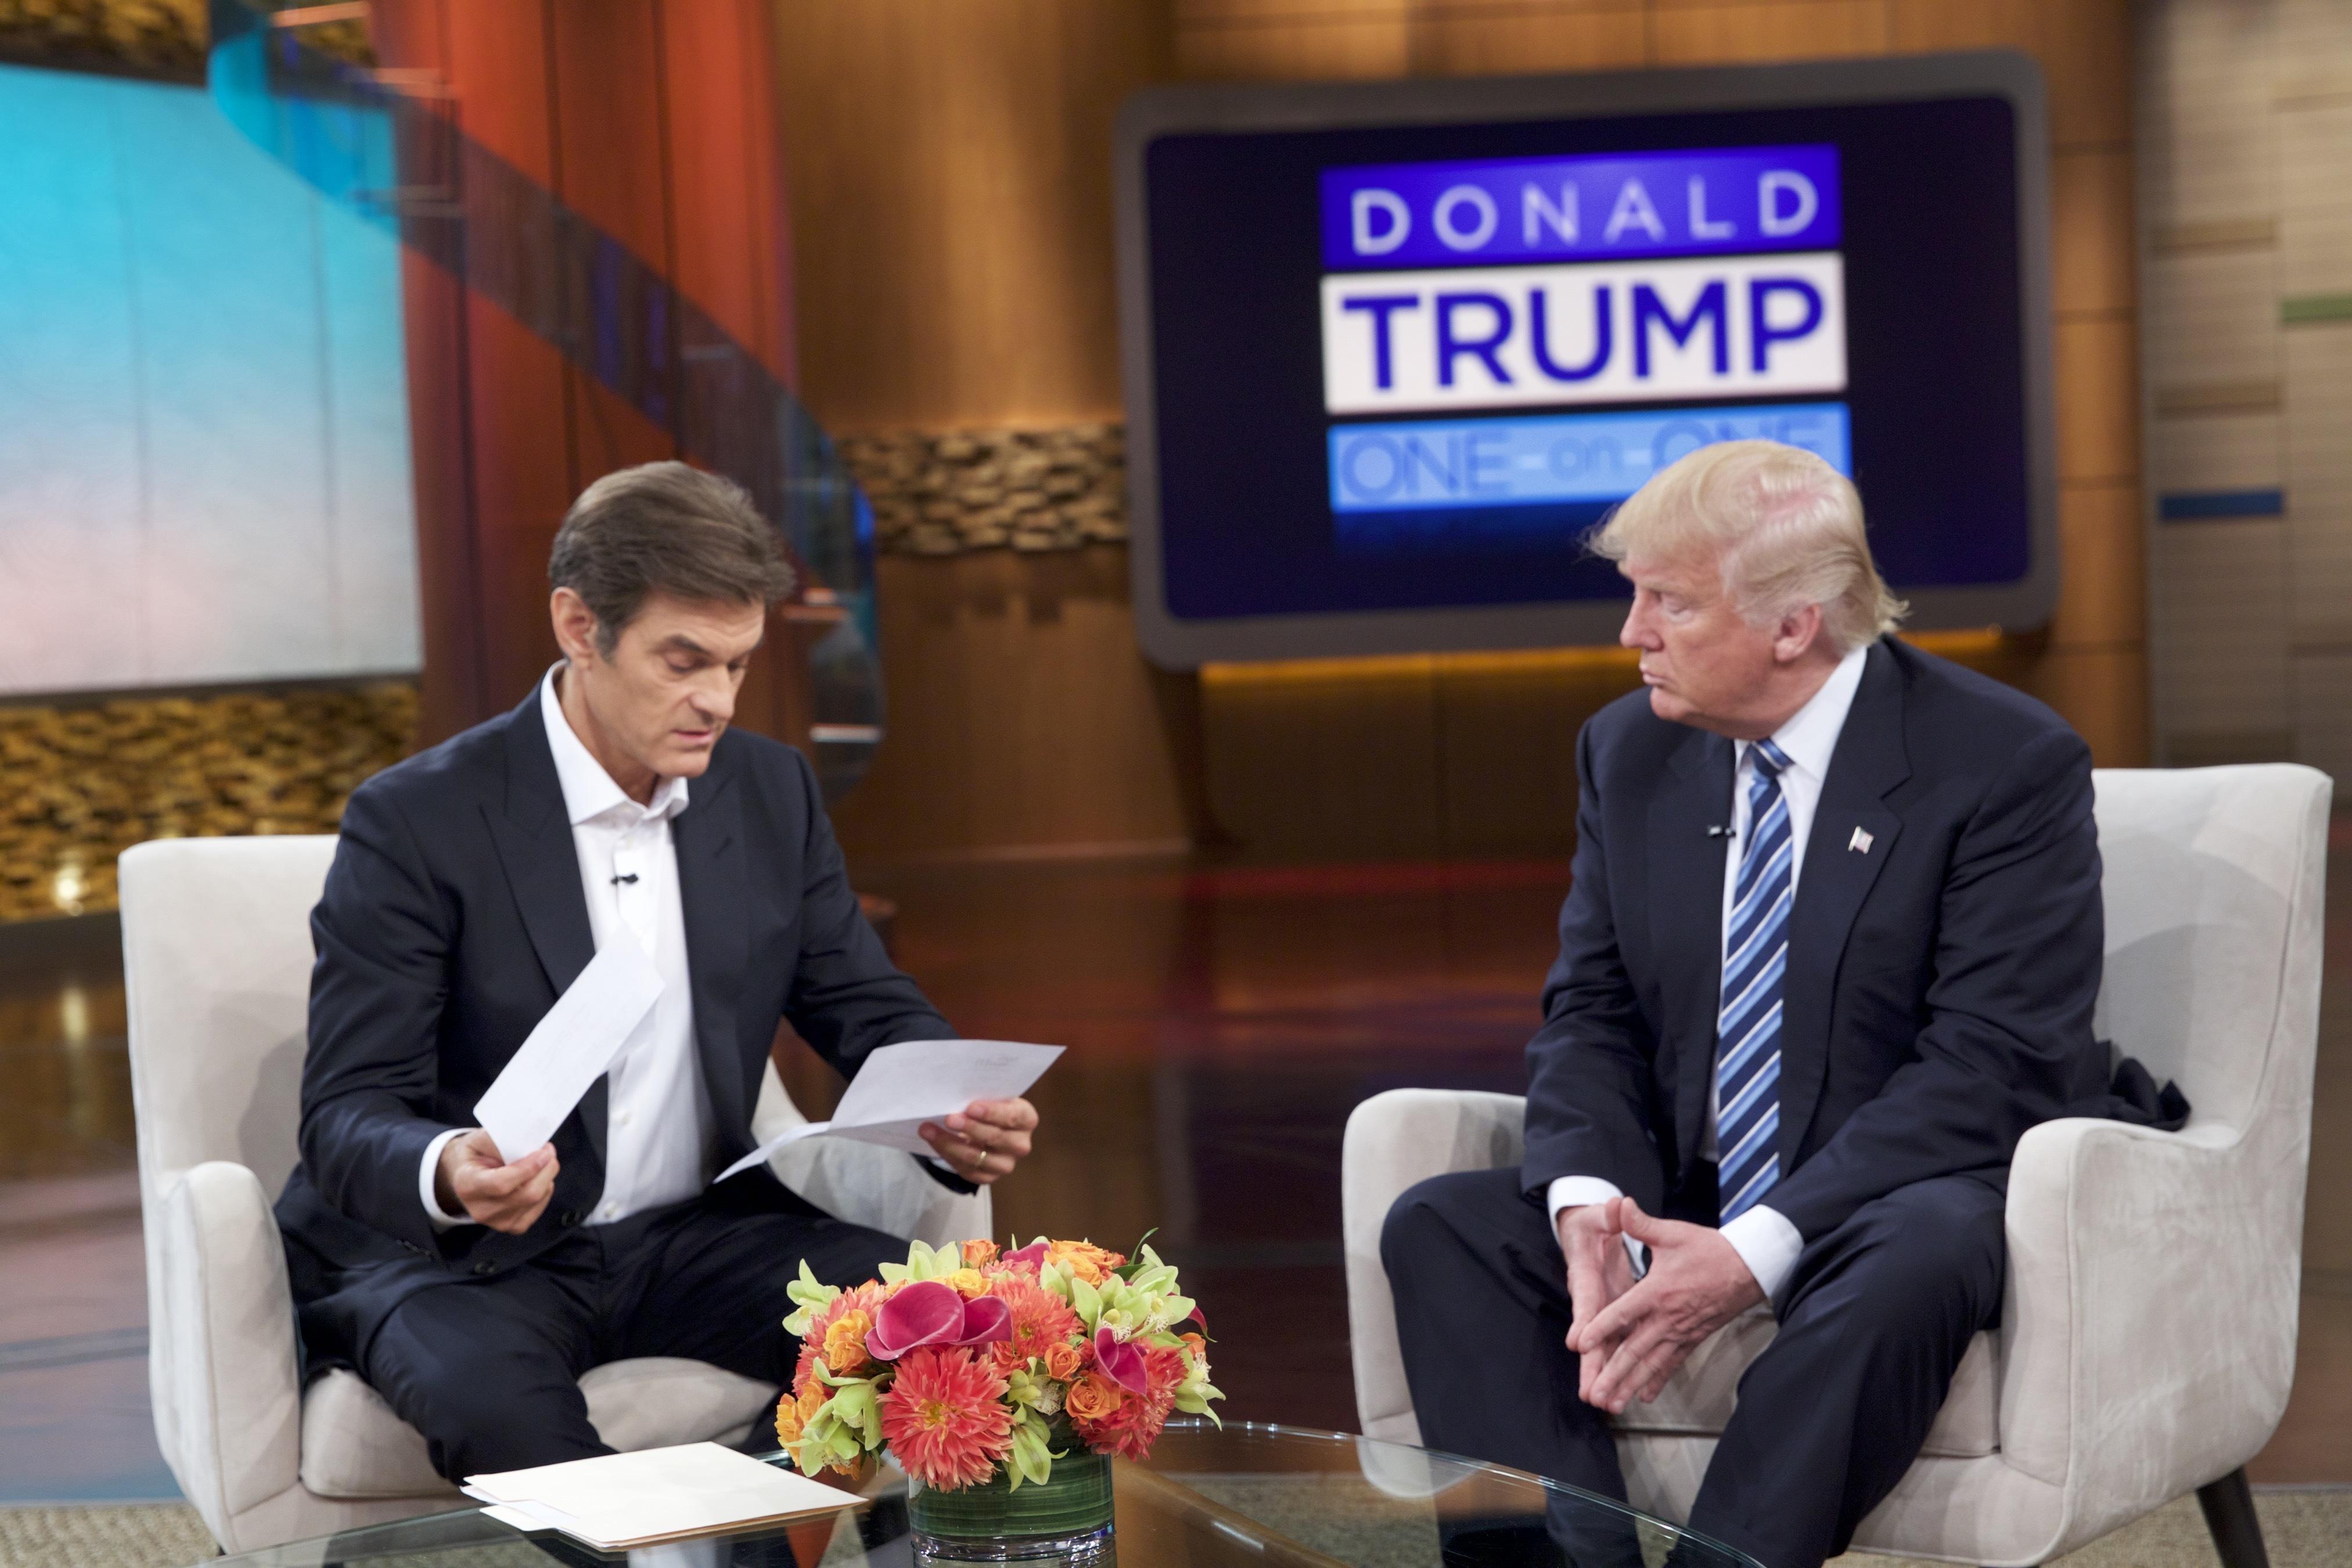 Trump's health status revealed: High cholesterol